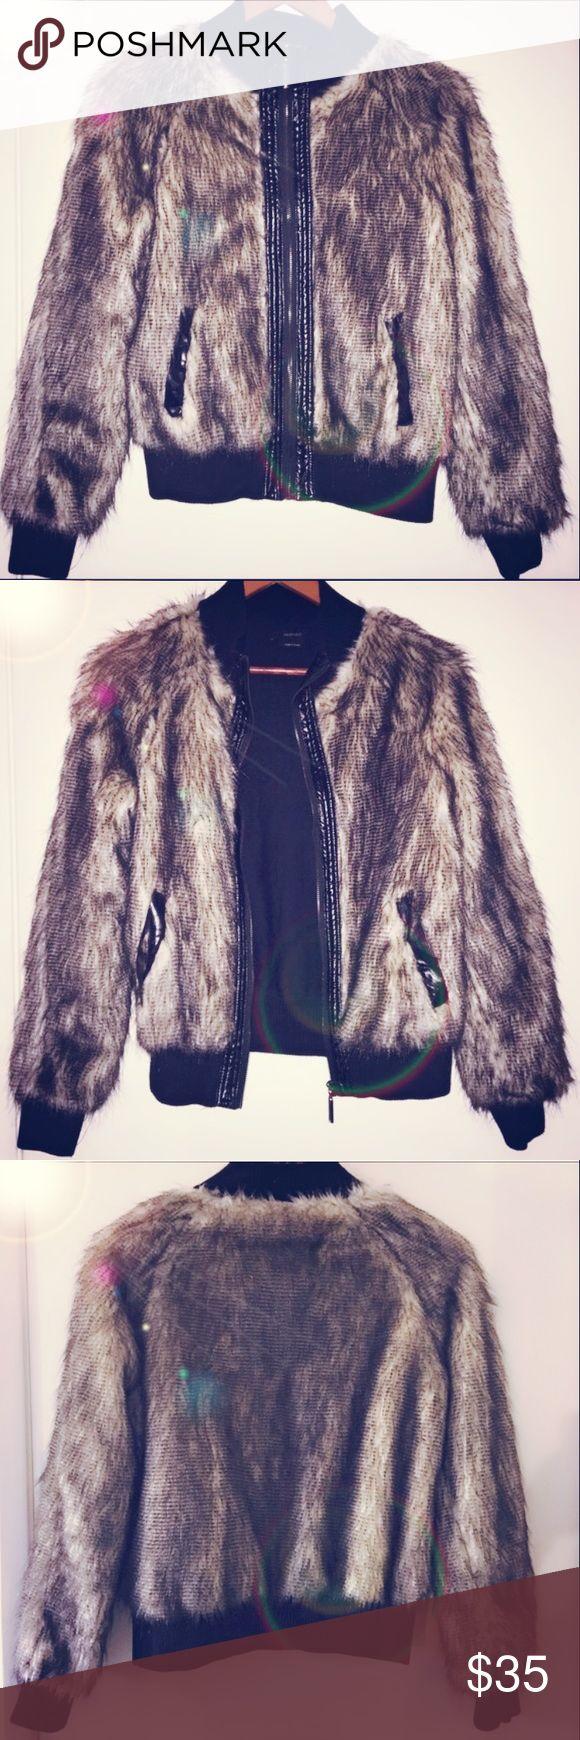 Women's Vertigo Faux Fur Jacket ✨ Zip up high collar faux fur jacket. Black trim with cream & black faux fur. Super comfy, super cute, super fabulous 🖤 Perfect condition. Jackets & Coats